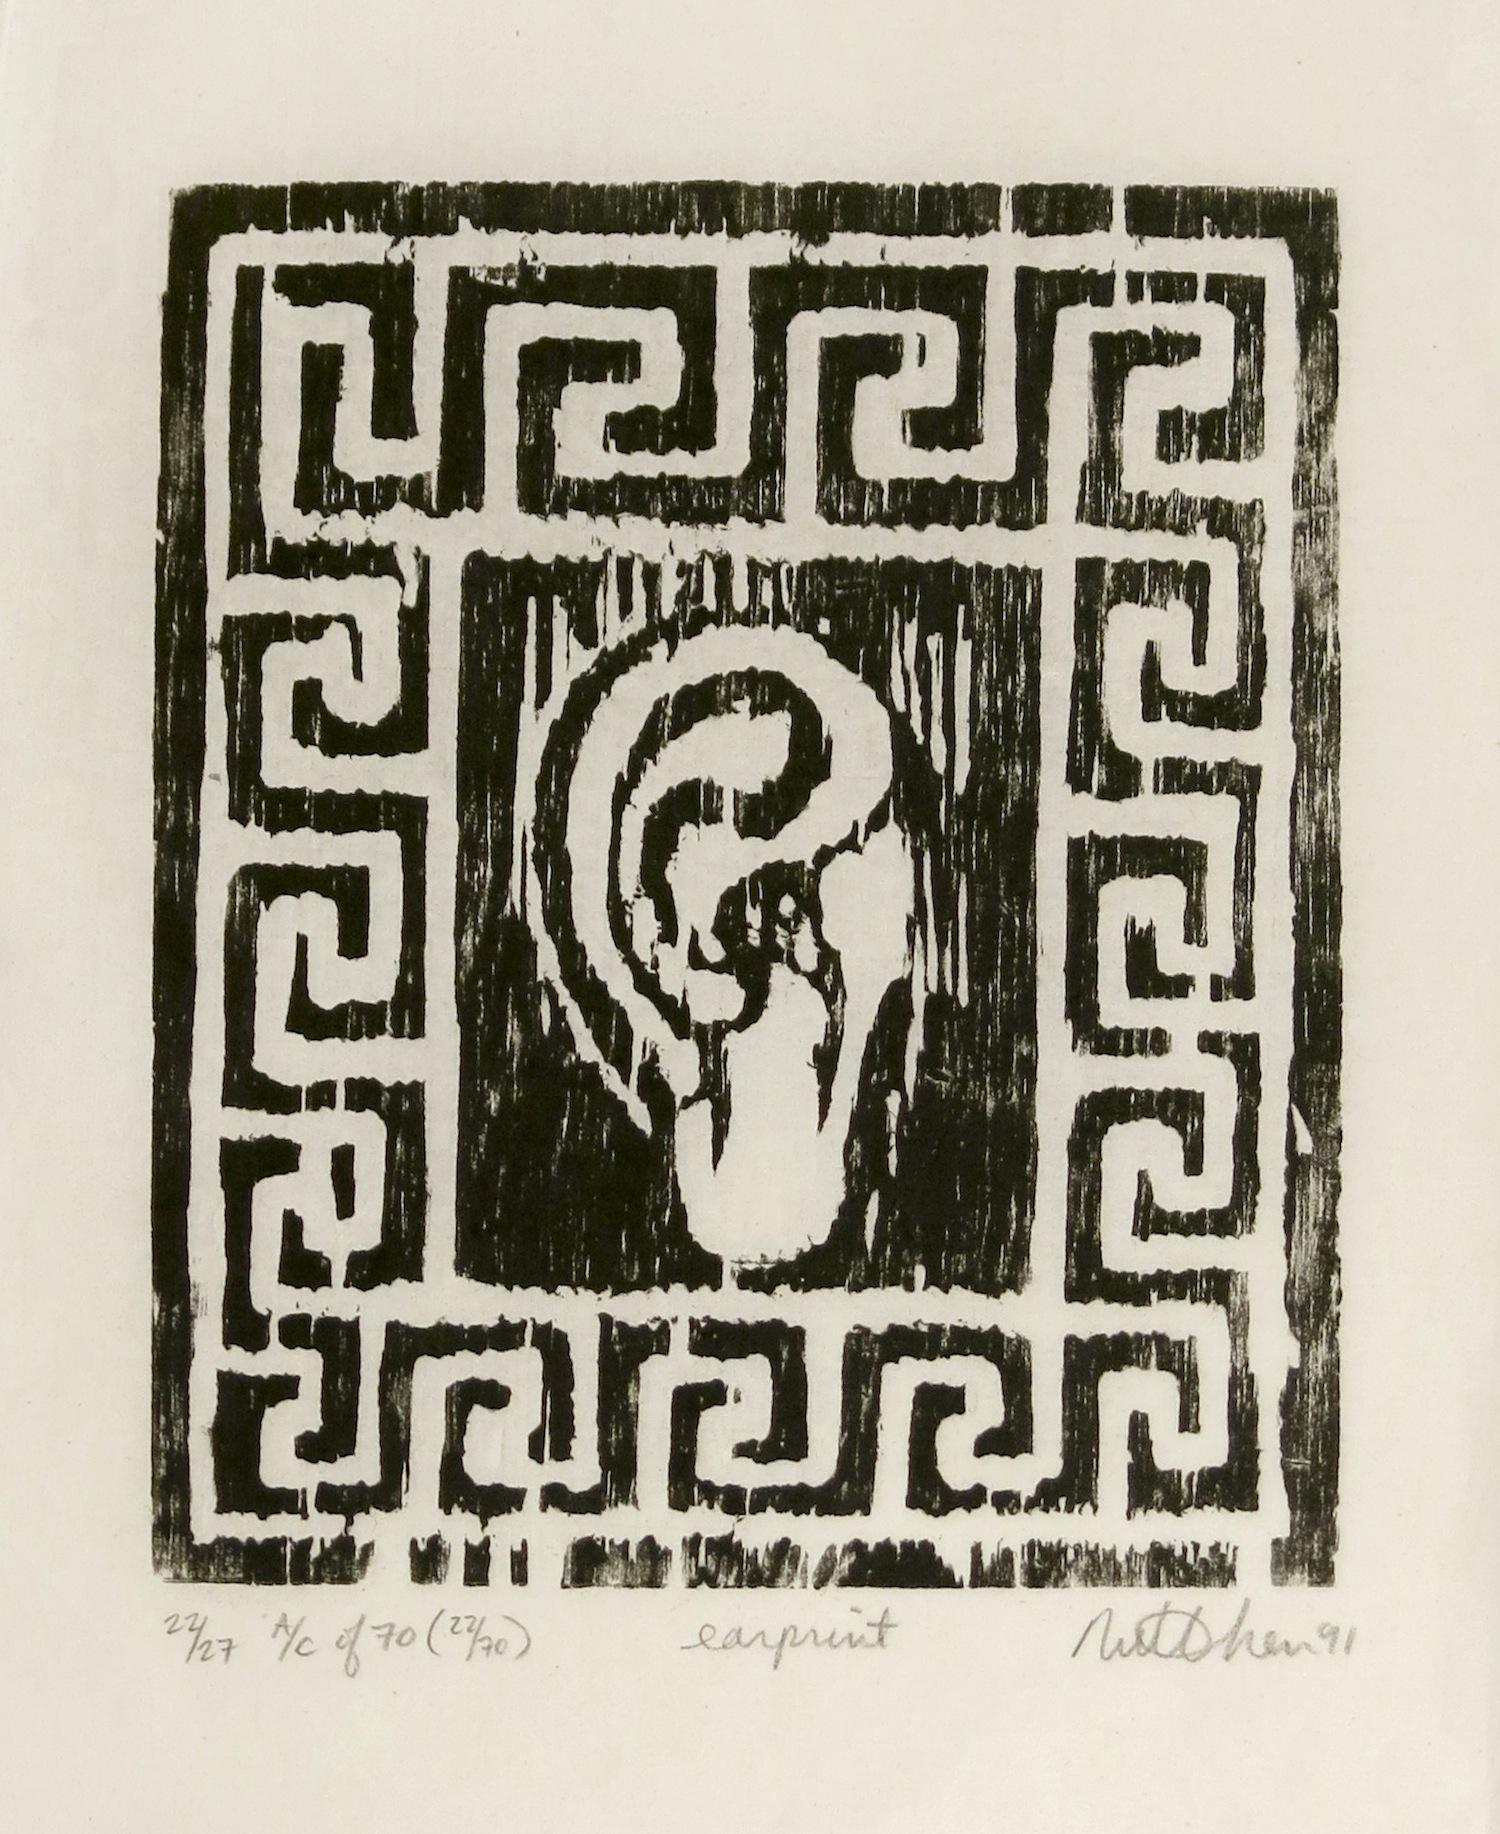 MILLIE CHEN  Earprint , 1991 Woodcut on rice paper